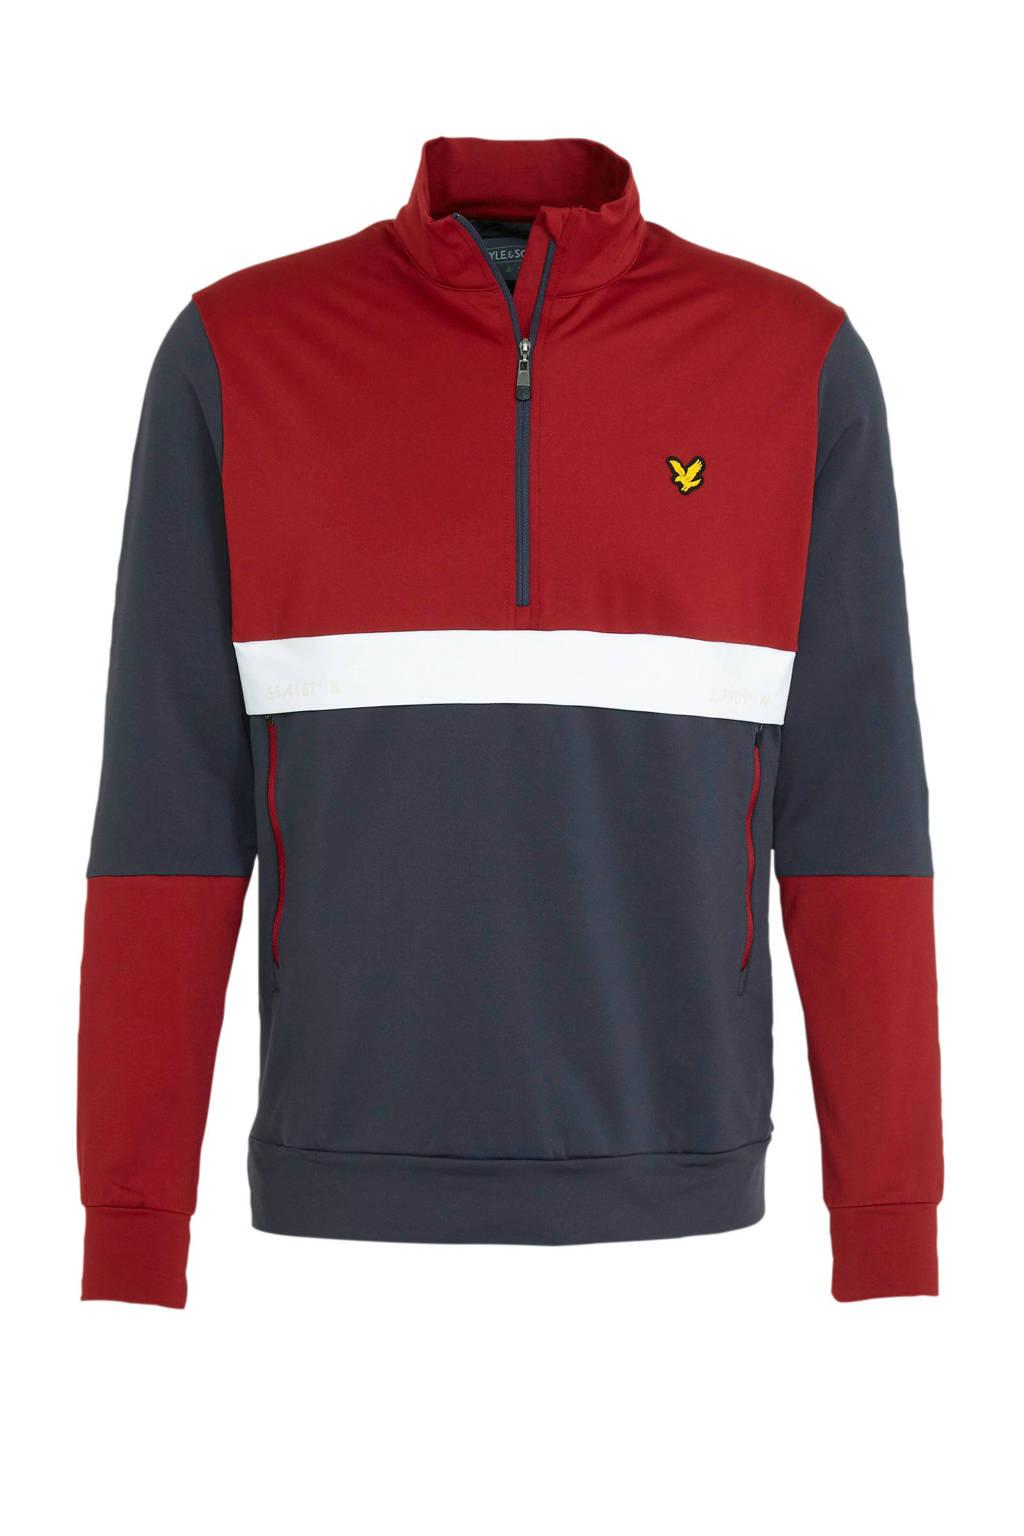 Lyle & Scott   sweater donkerblauw/rood, Donkerblauw/rood